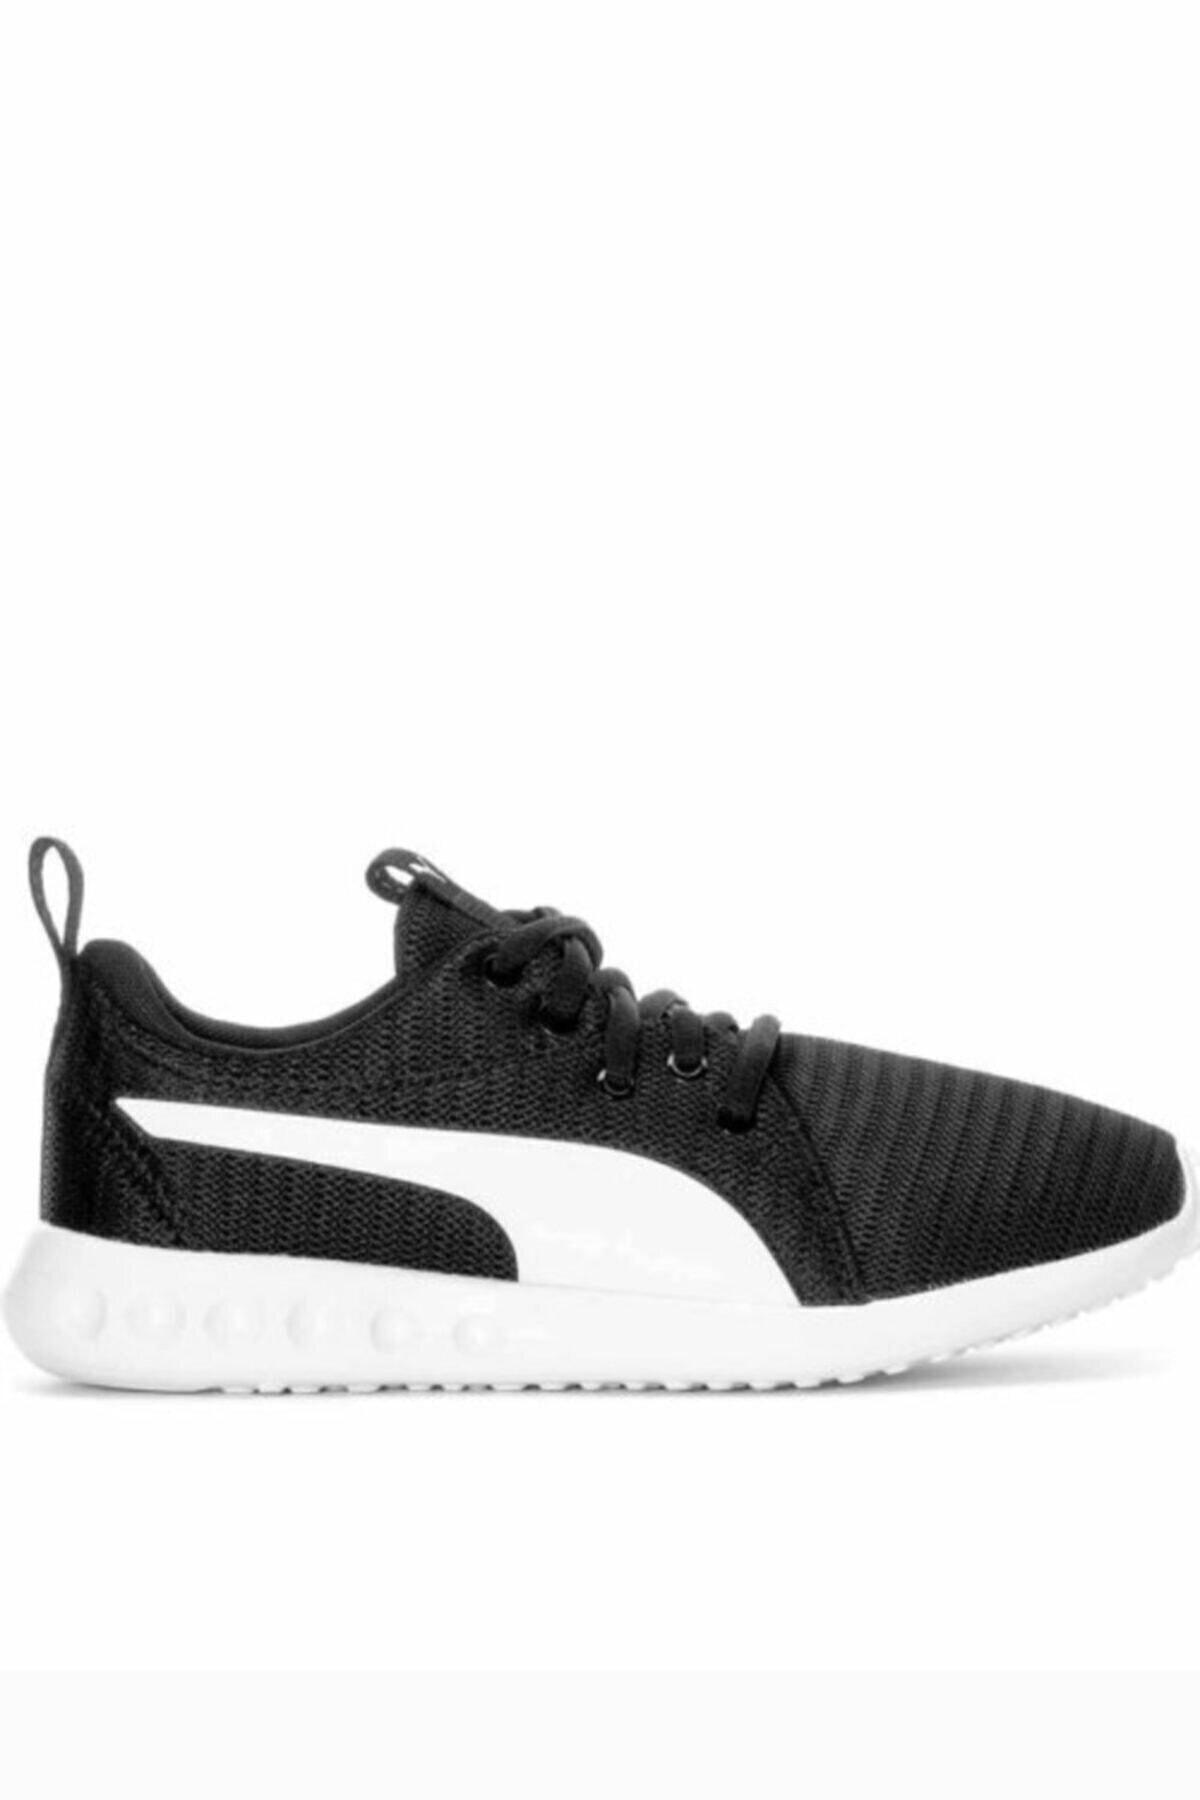 Puma Unisex Siyah Sneaker Carson 2 Jr 2